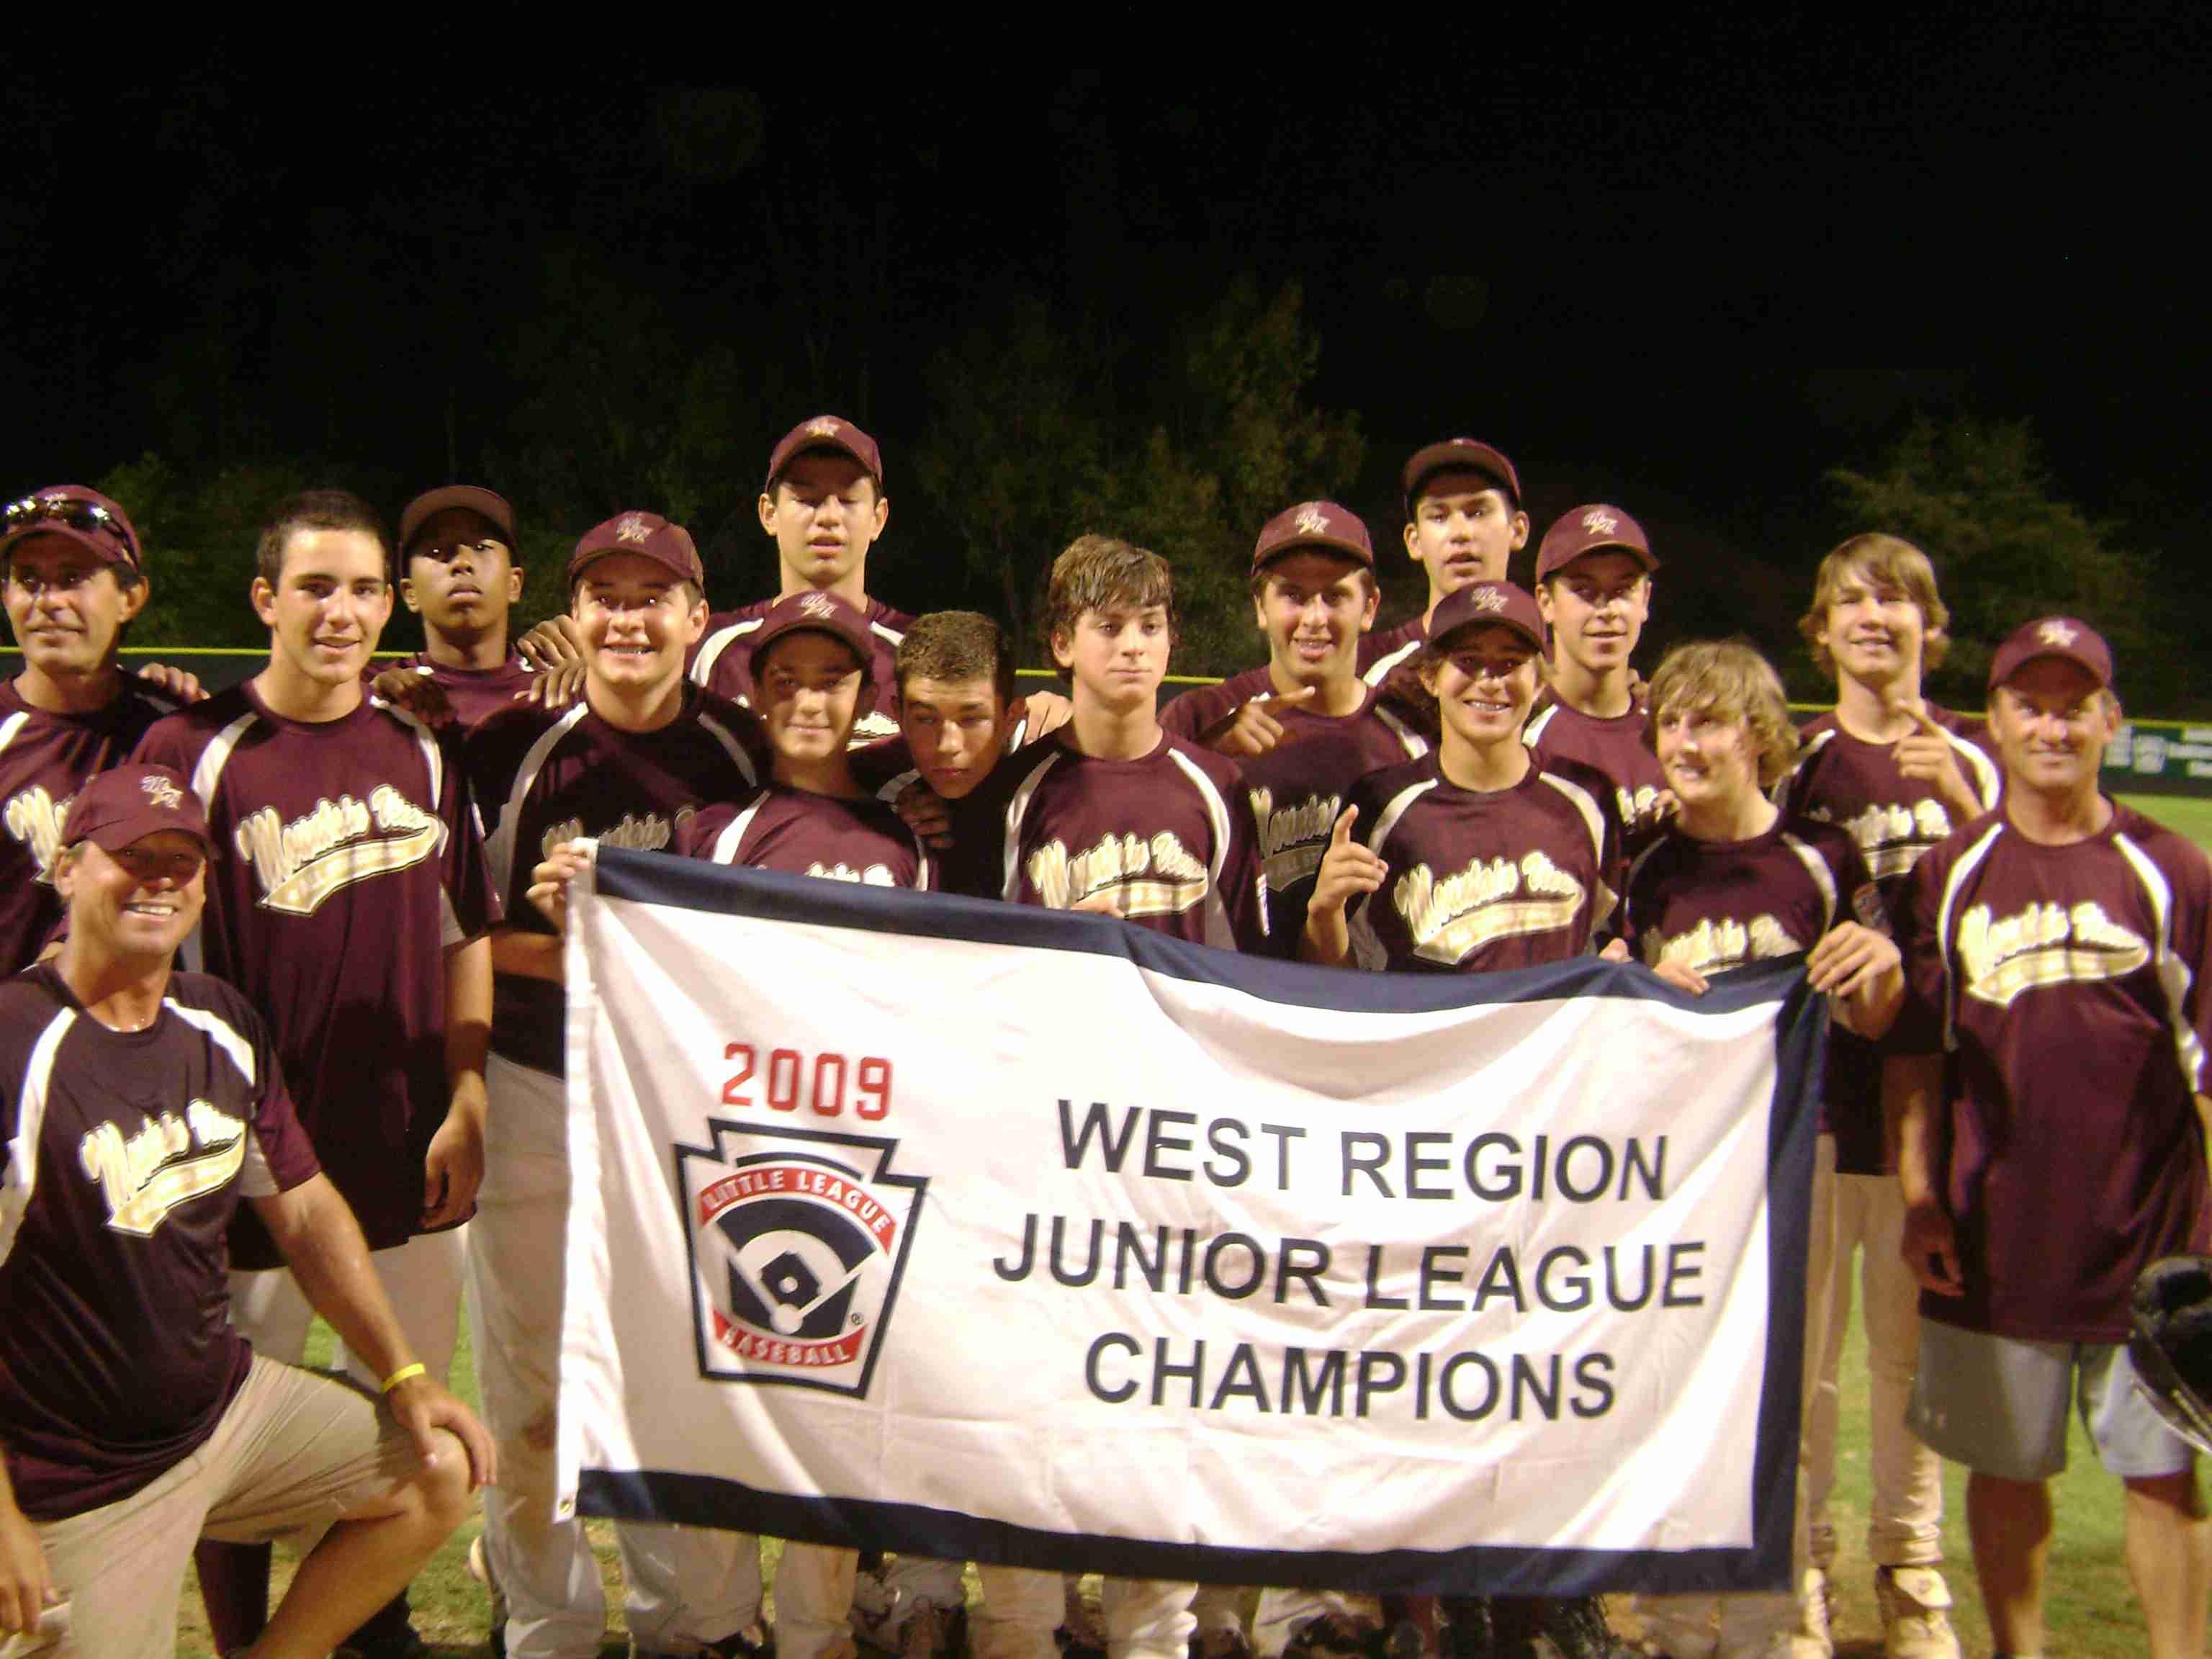 2009 MVLL 13-14s Western Region Champs